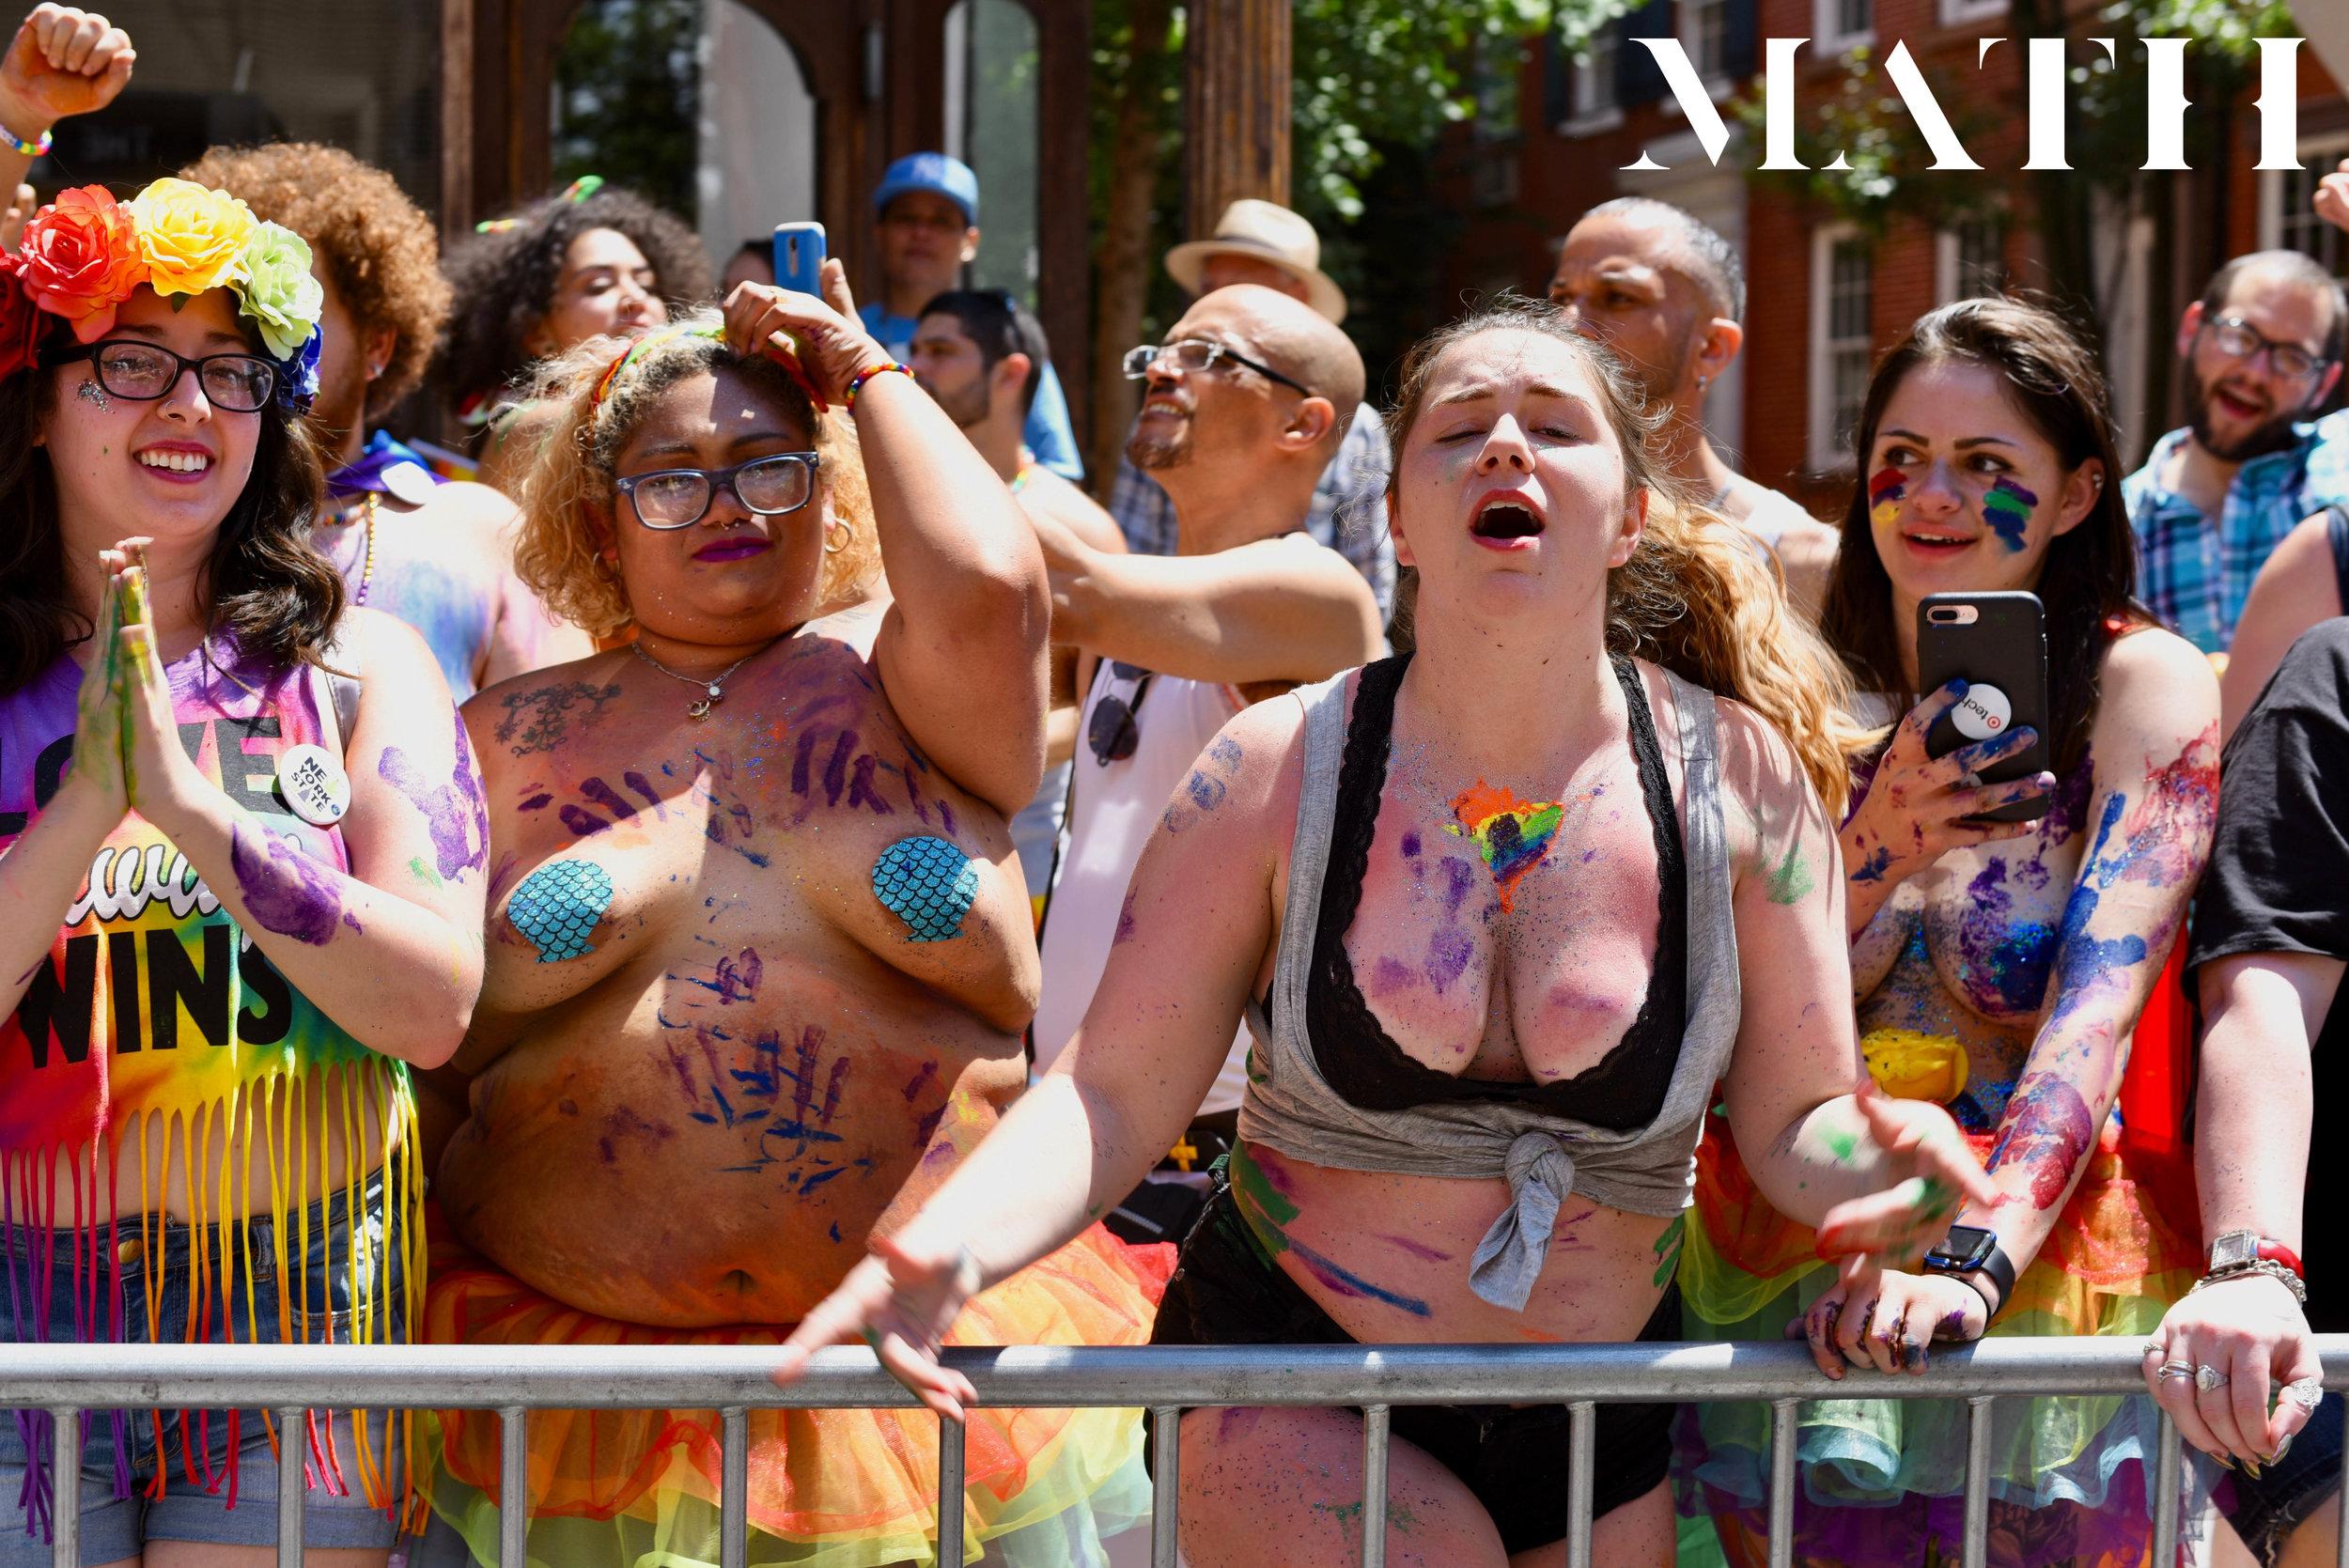 NYC Pride_Ginger Hollander 22.jpg